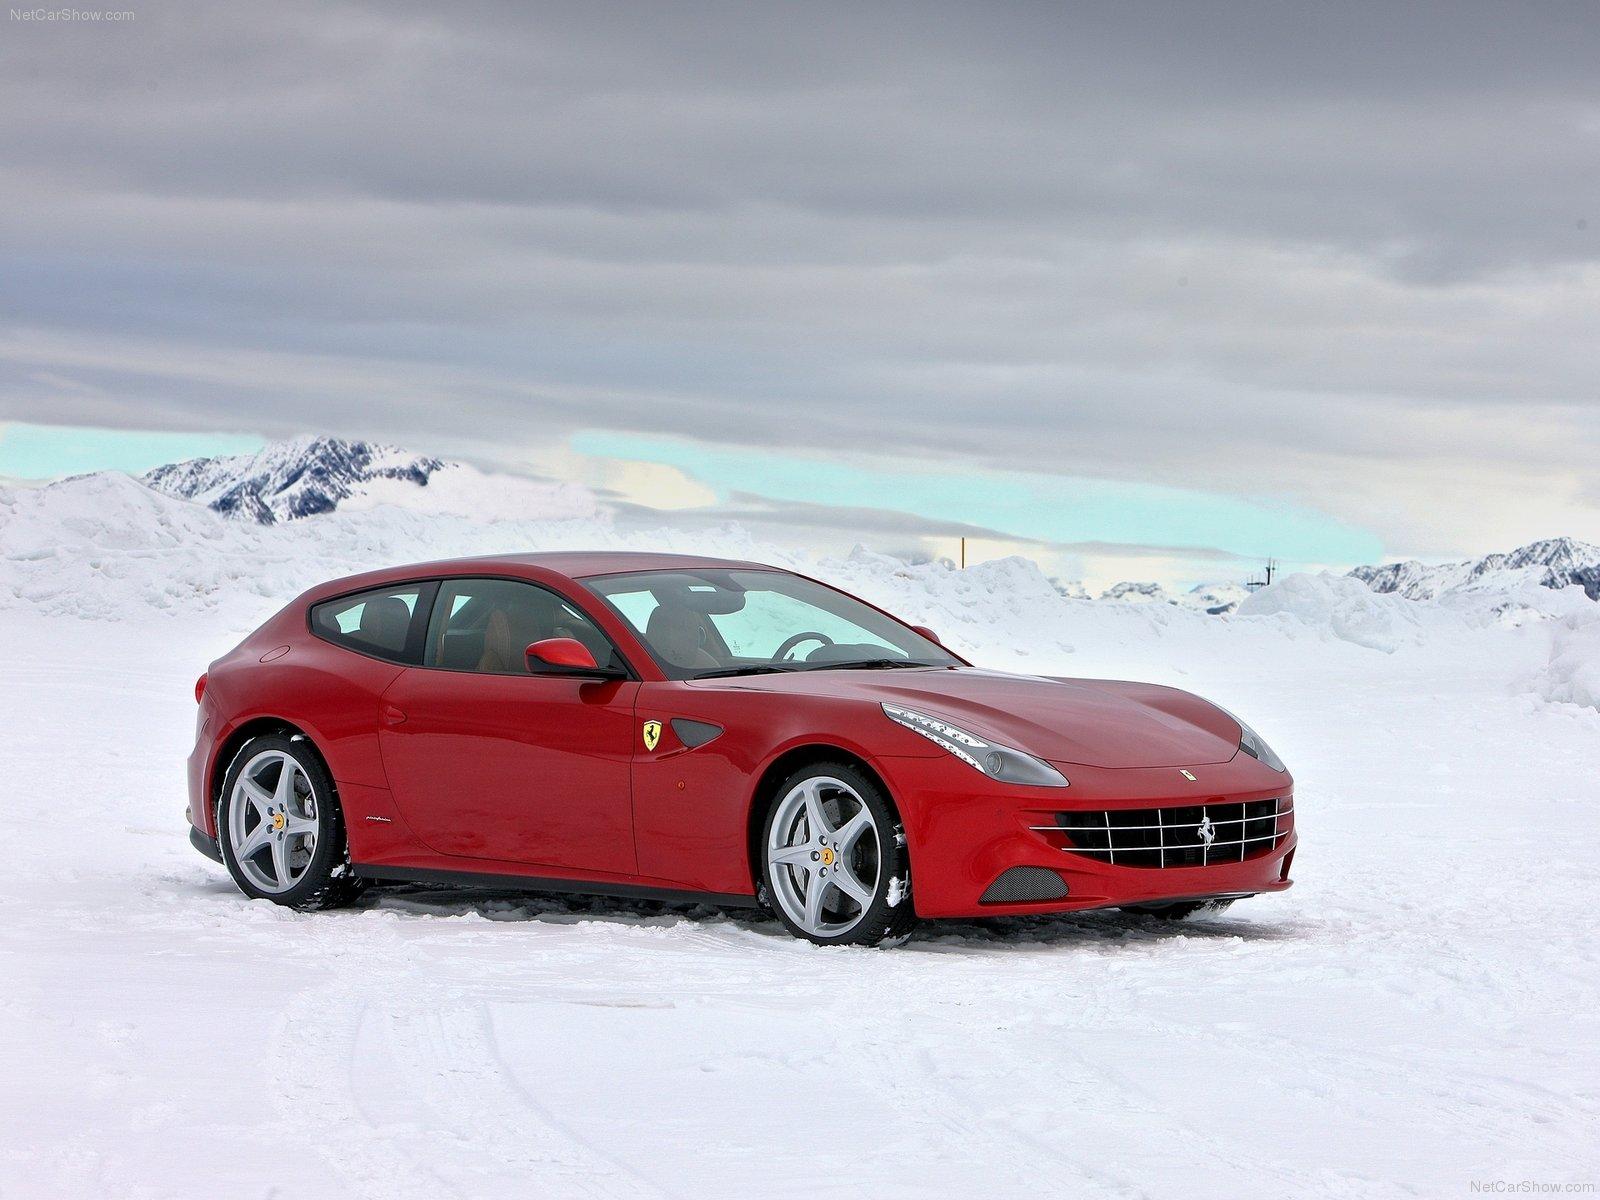 СМИ показали разгон Ferrari GTC4 Lusso на заснеженной трассе